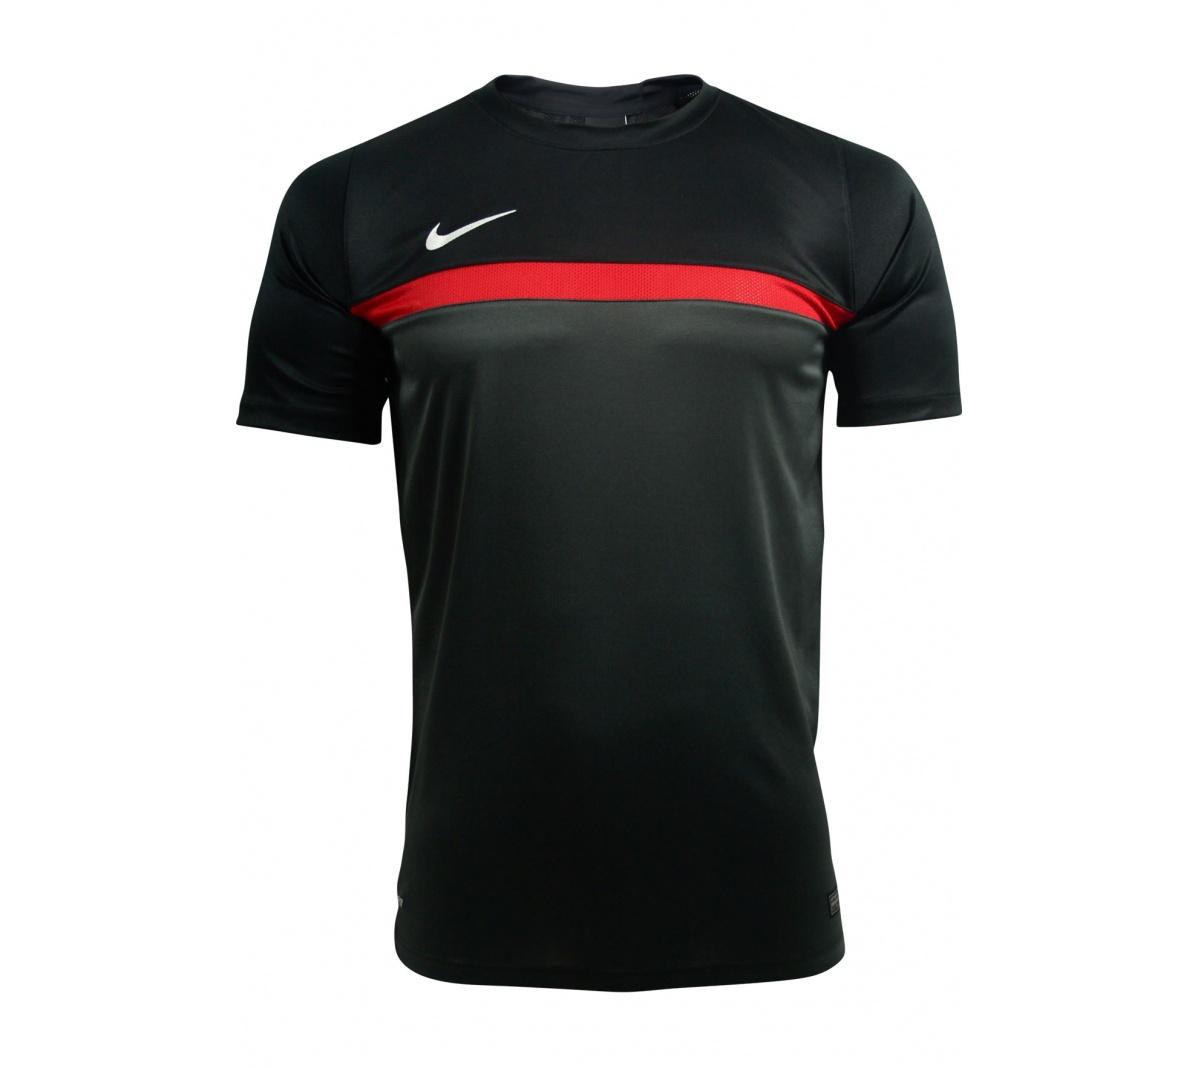 7558dddf0d09f Camisa Nike Academy SS Training Pt/Vm - Mundo do Futebol